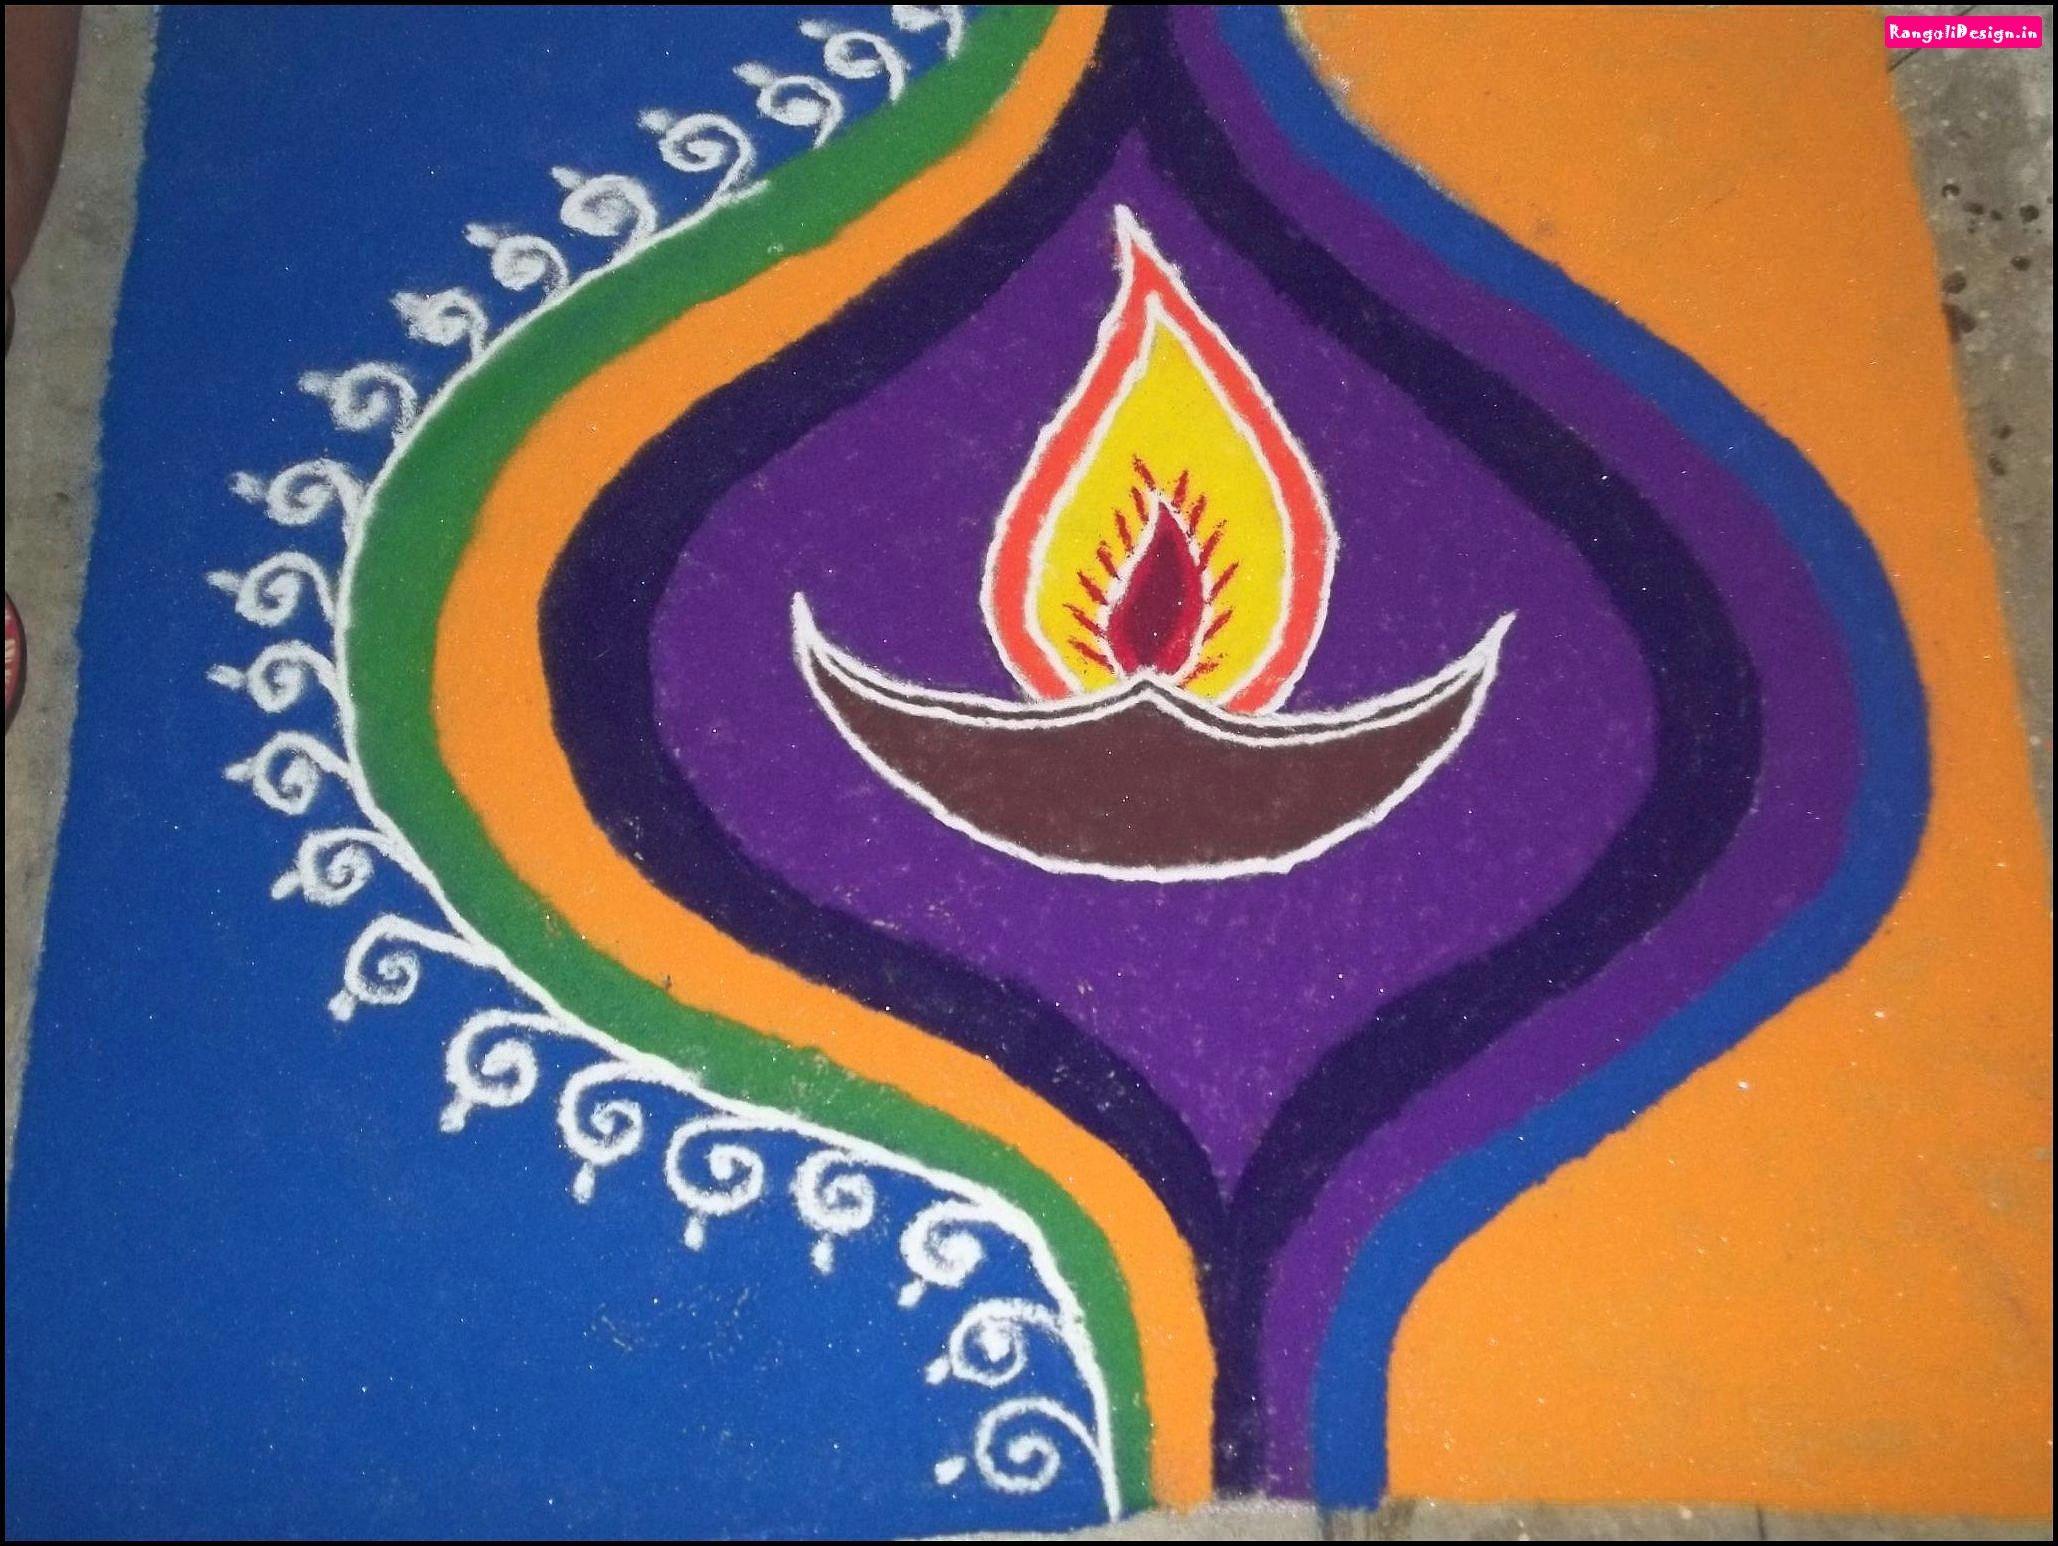 Easy Diya rangoli designs #rangolidesigns | Rangoli | Pinterest ... for rangoli designs for diwali with diya  45gtk